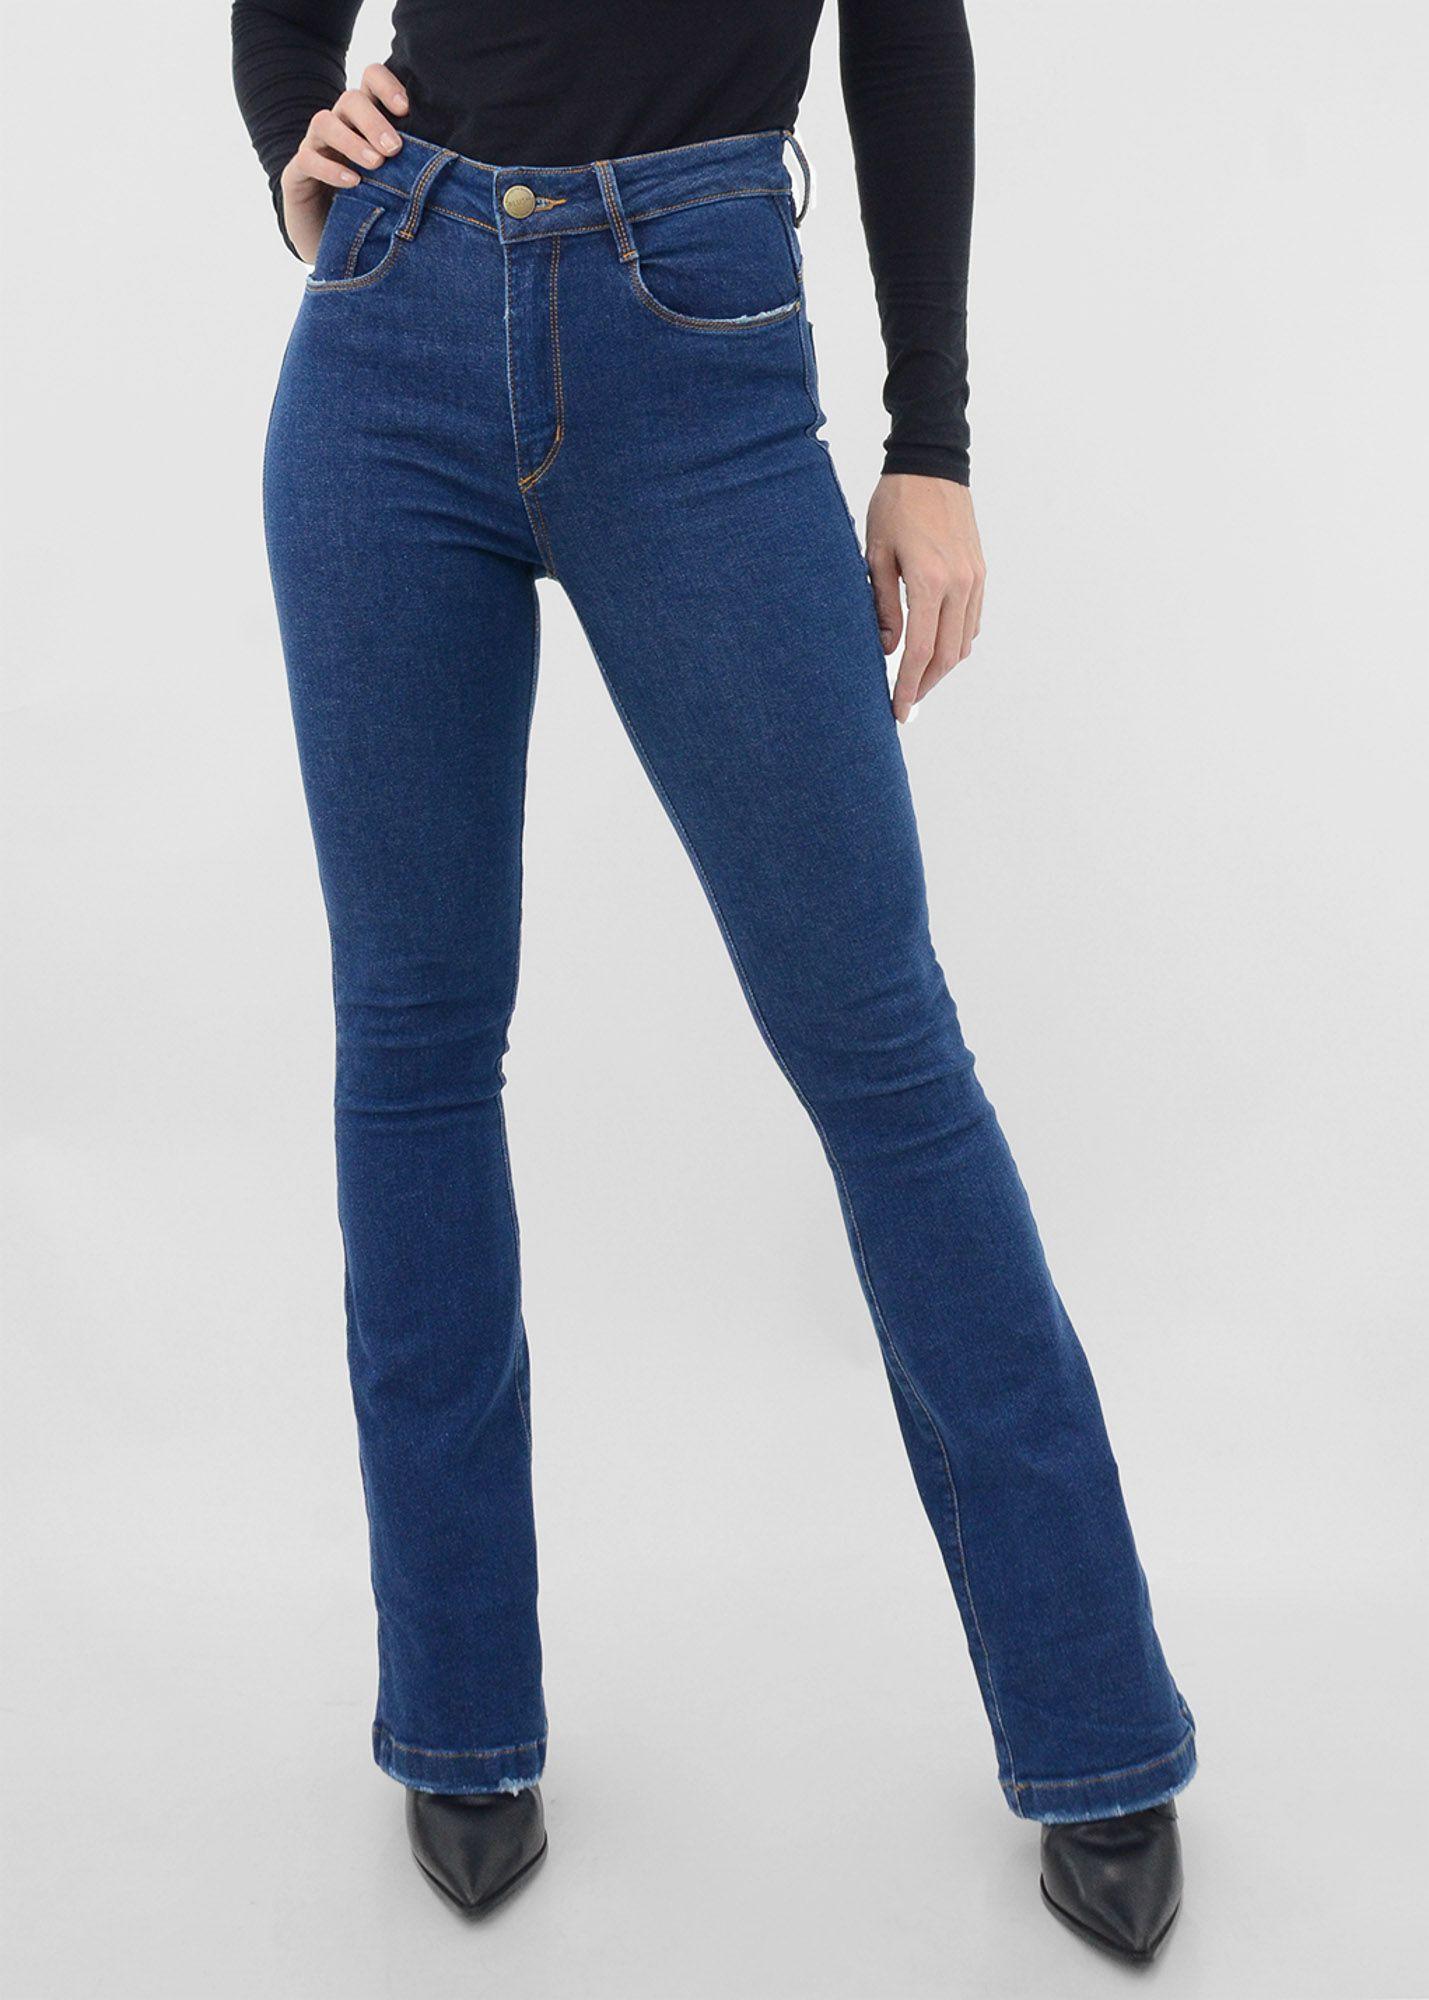 Calça Flare Jeans Los Angeles